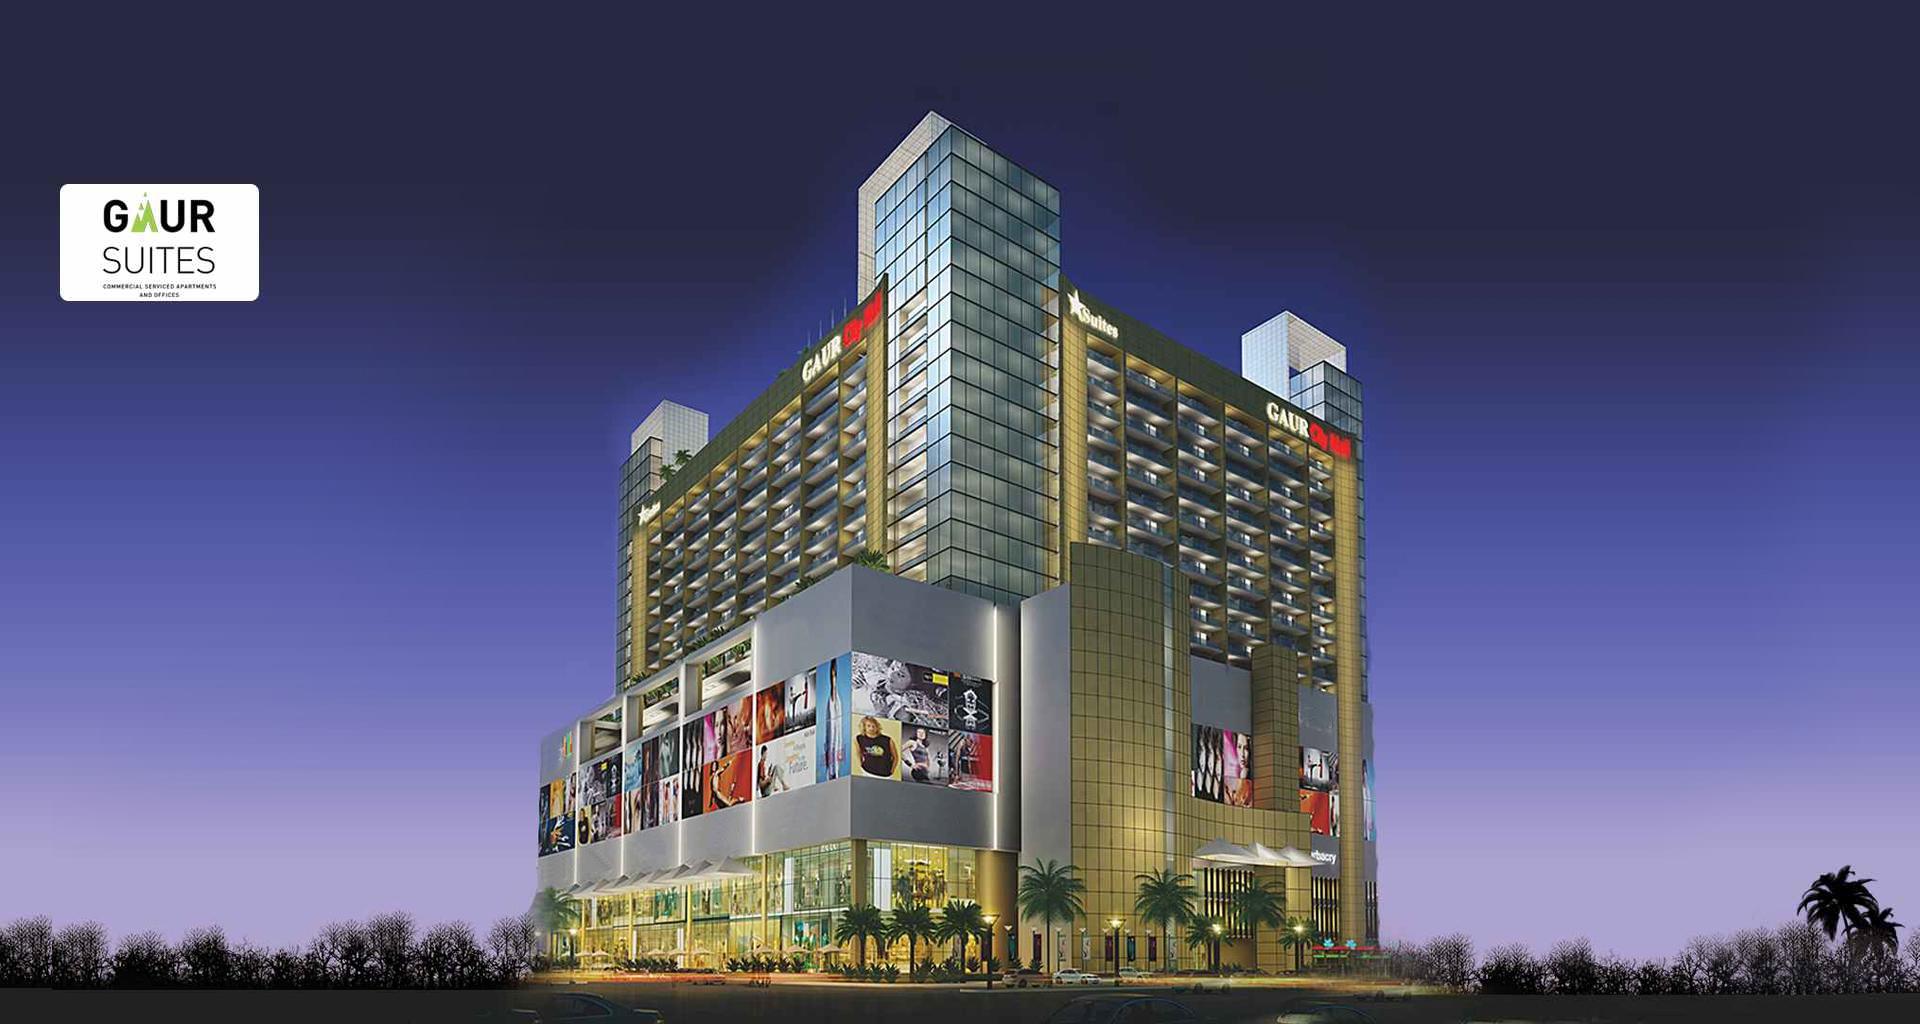 gaur city-suites